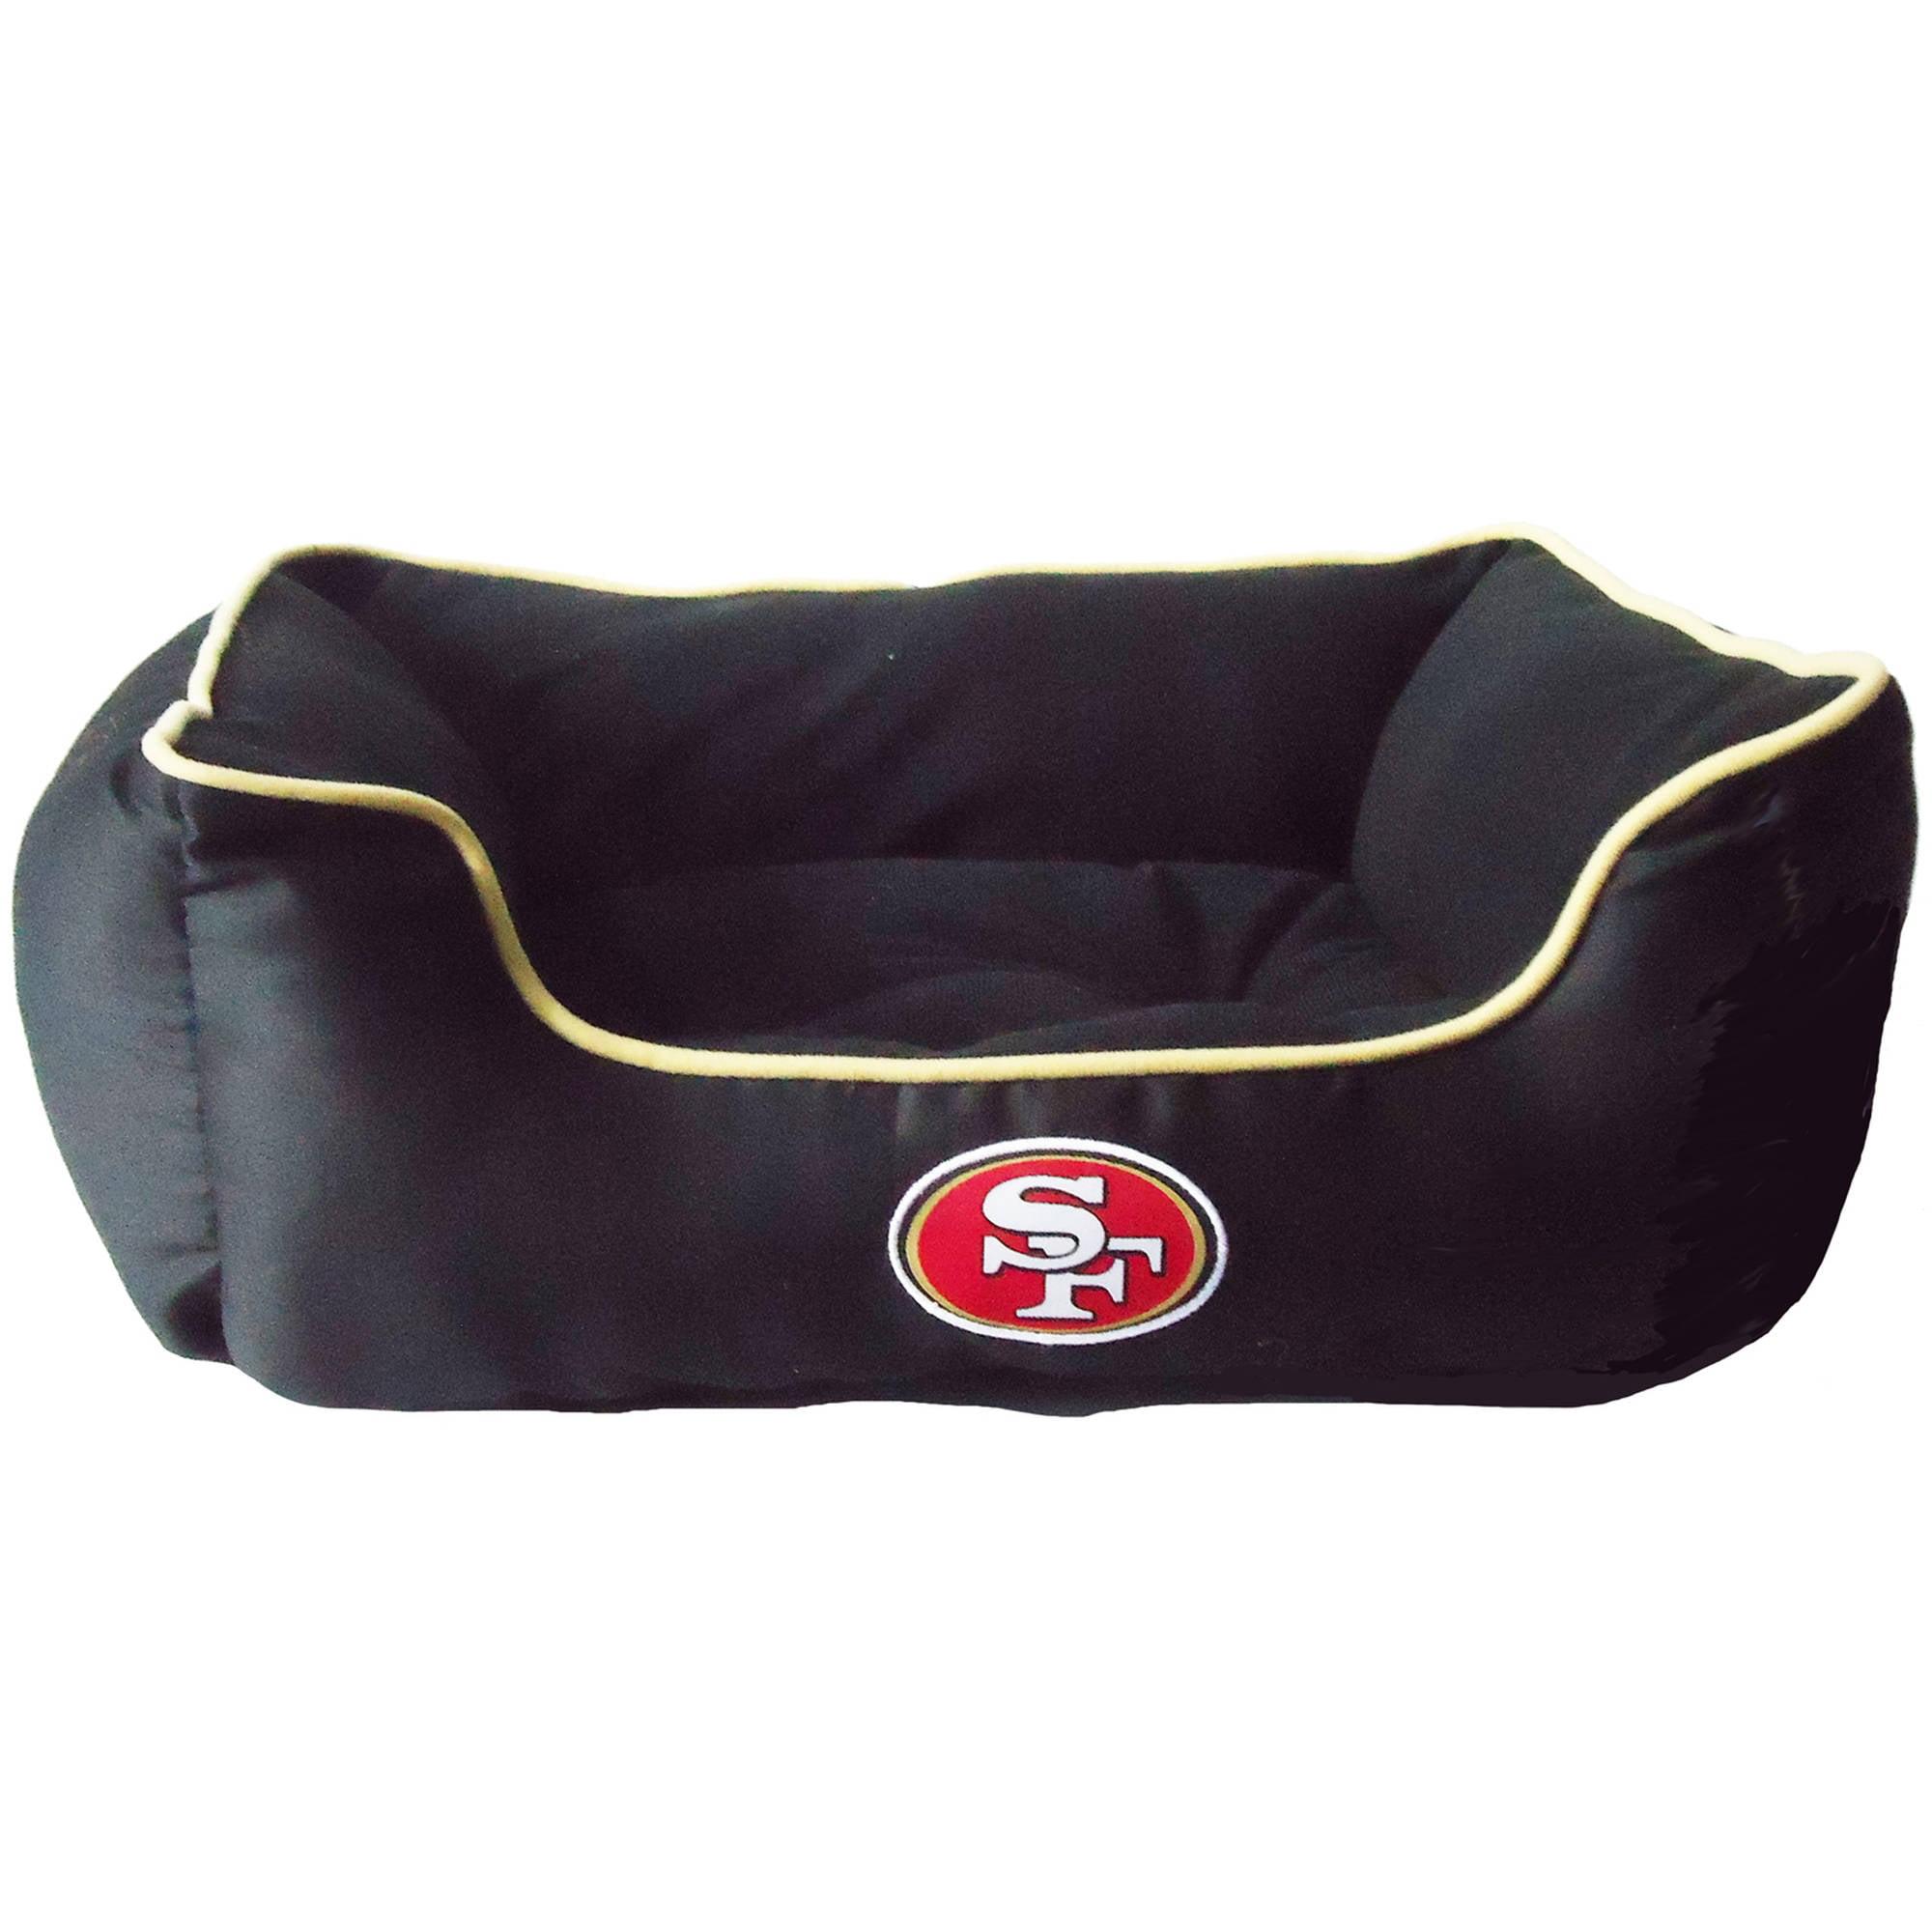 Pets First NFL San Francisco 49ers Pet Bed